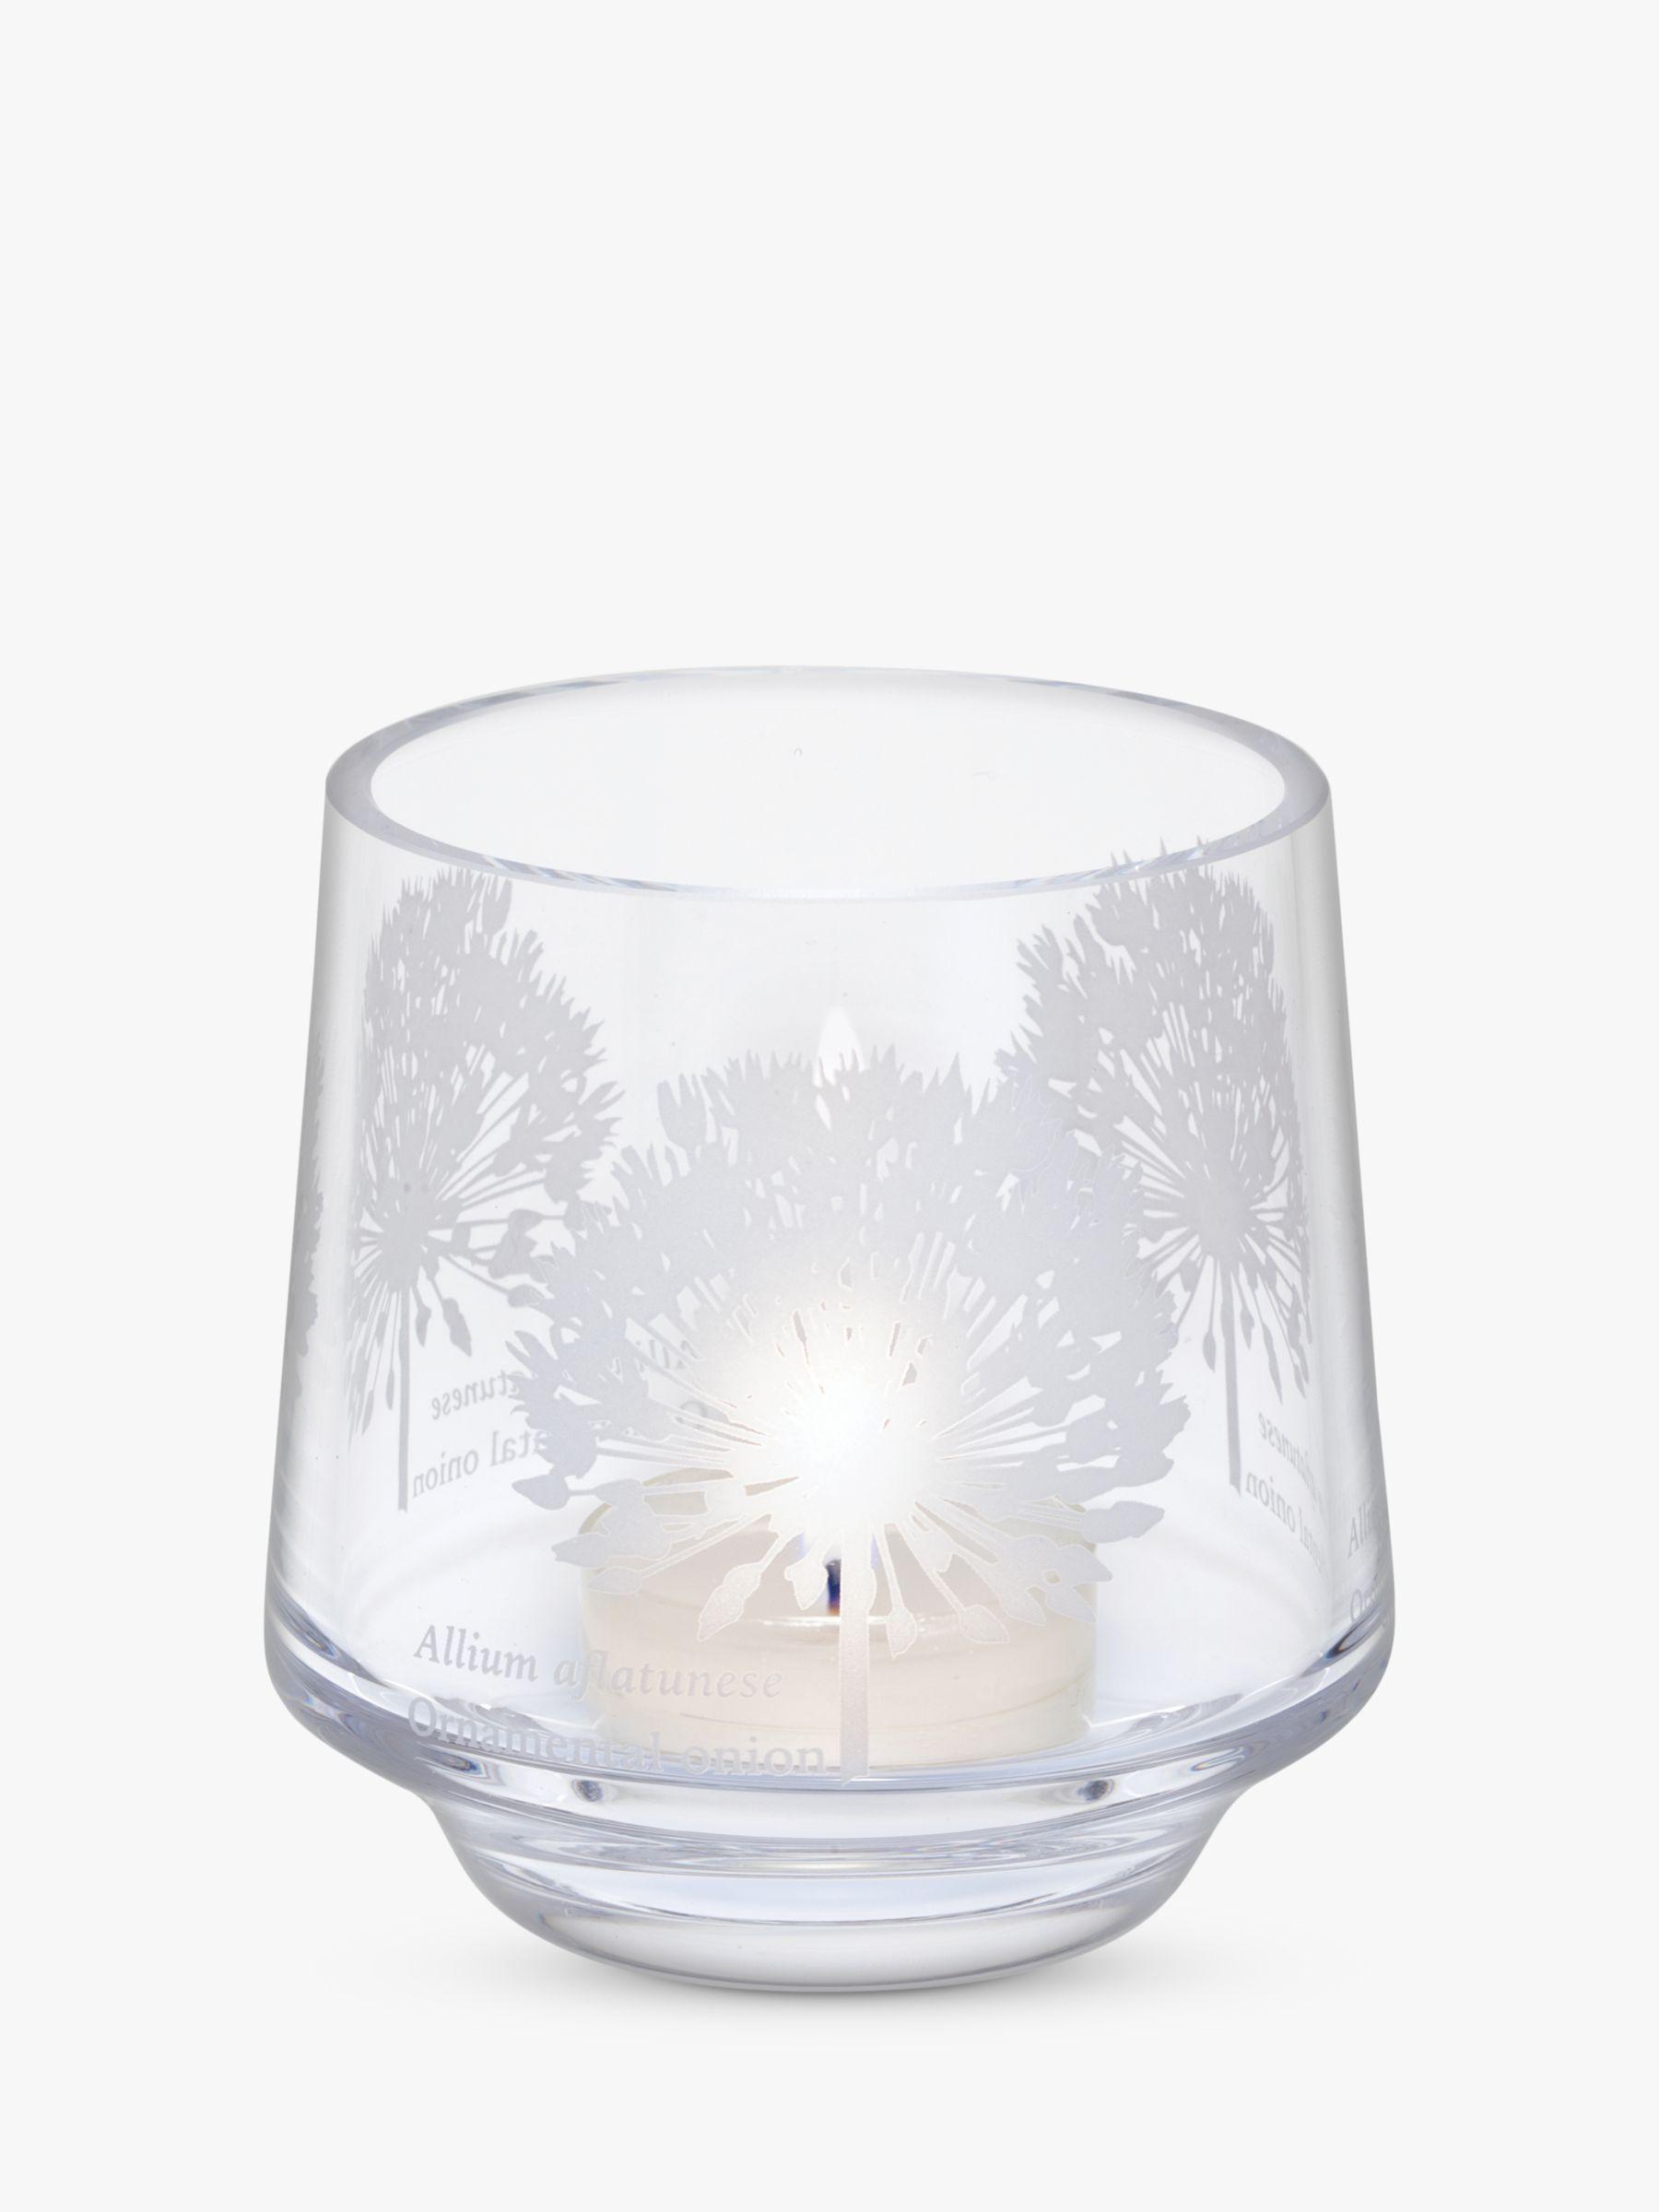 Dartington Crystal Dartington Crystal Bloom Allium Votive with Tealight